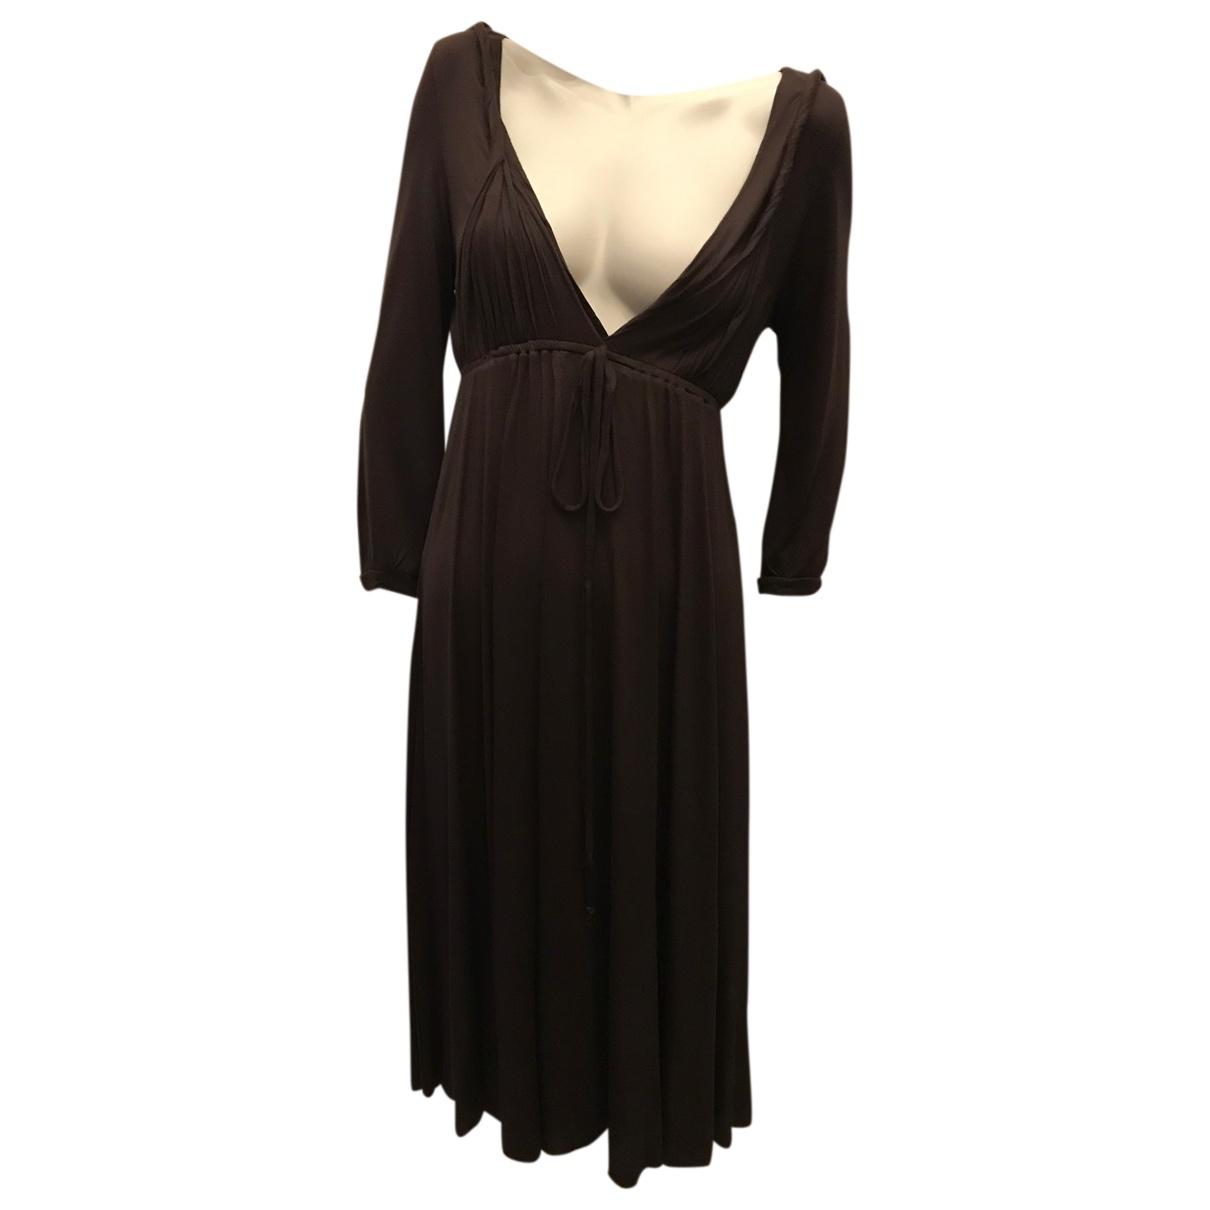 Maje - Robe   pour femme en coton - marron